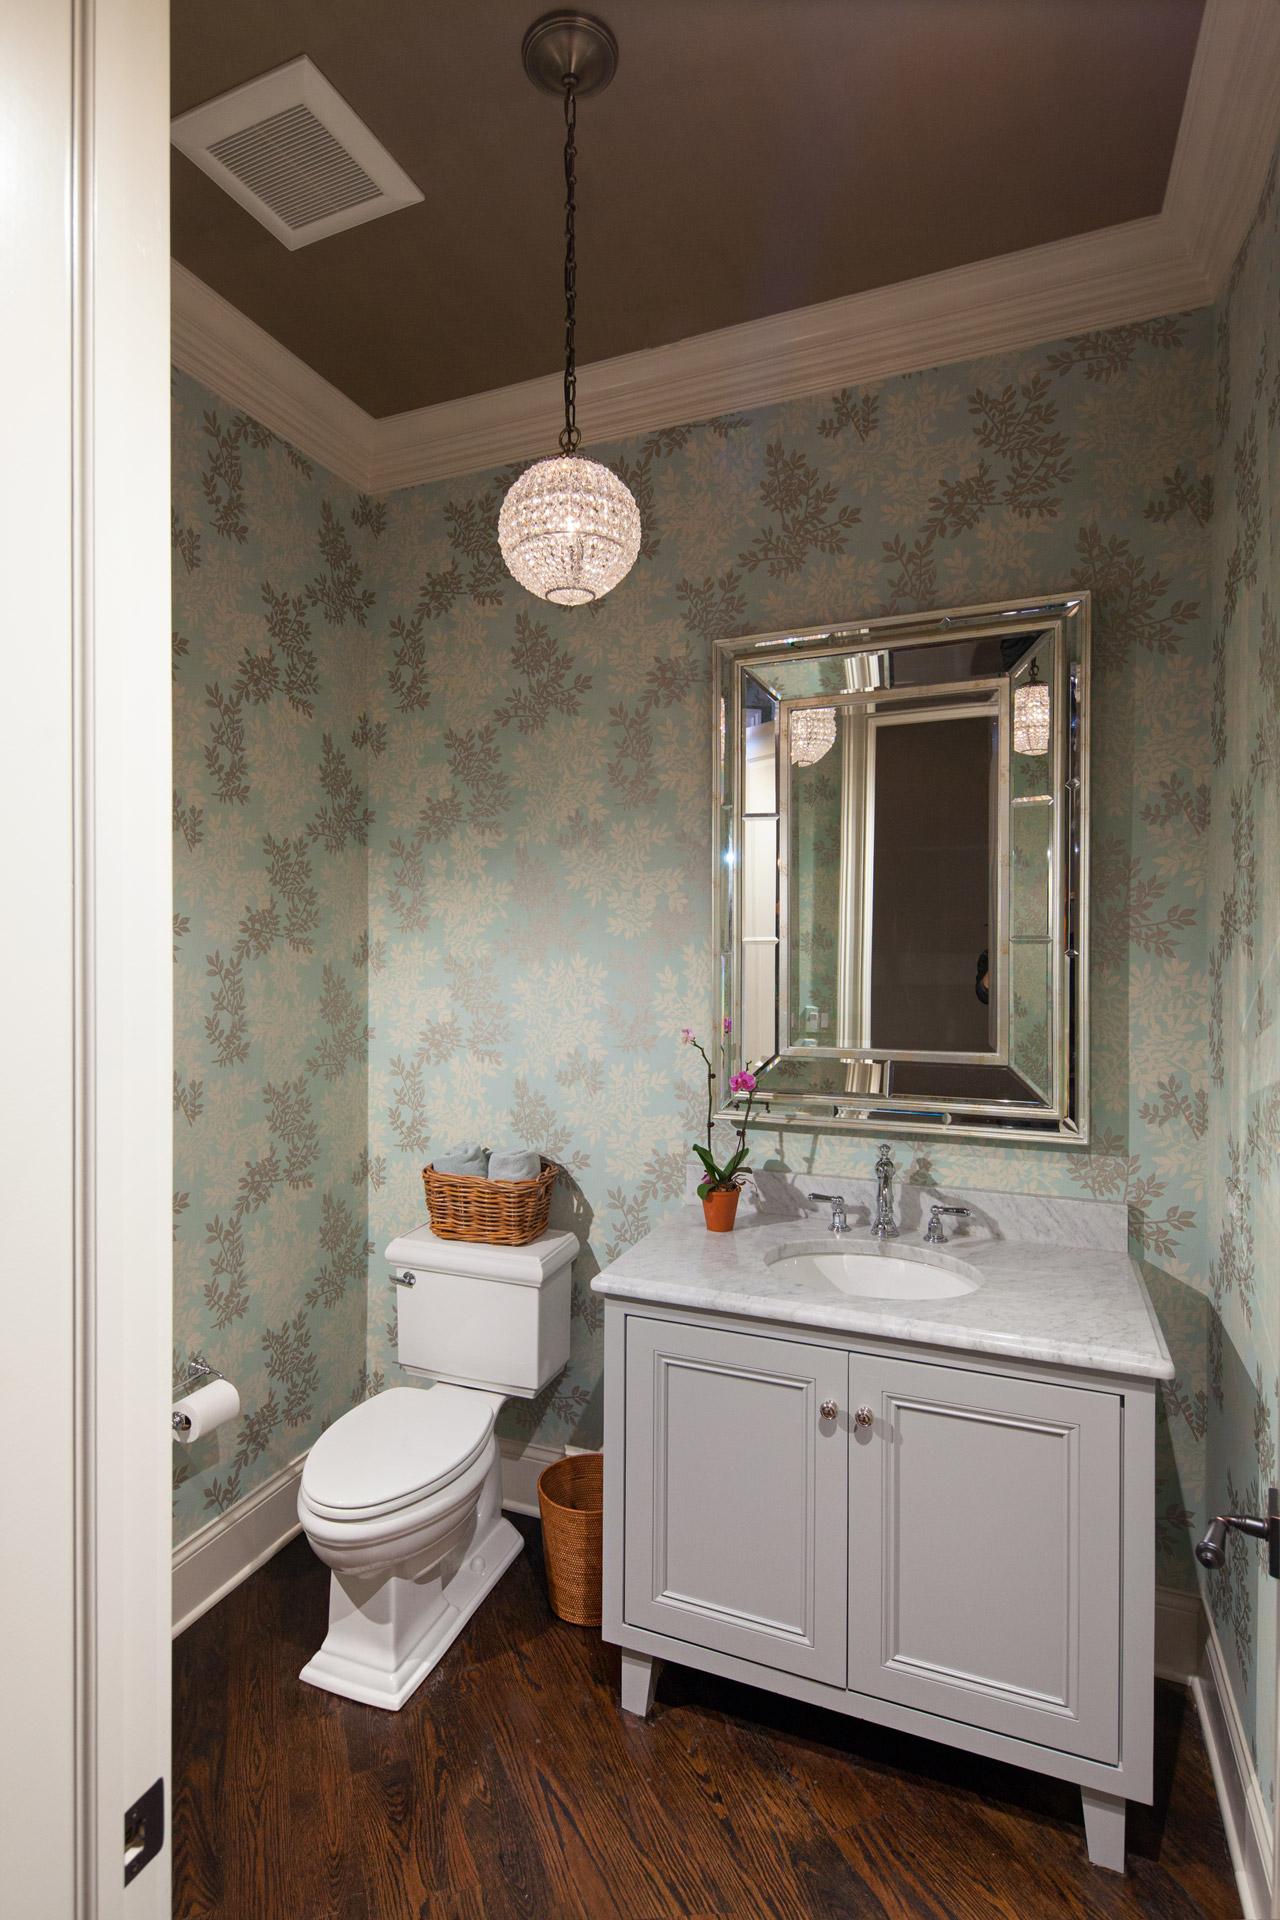 Powder room wallpaper La Grange